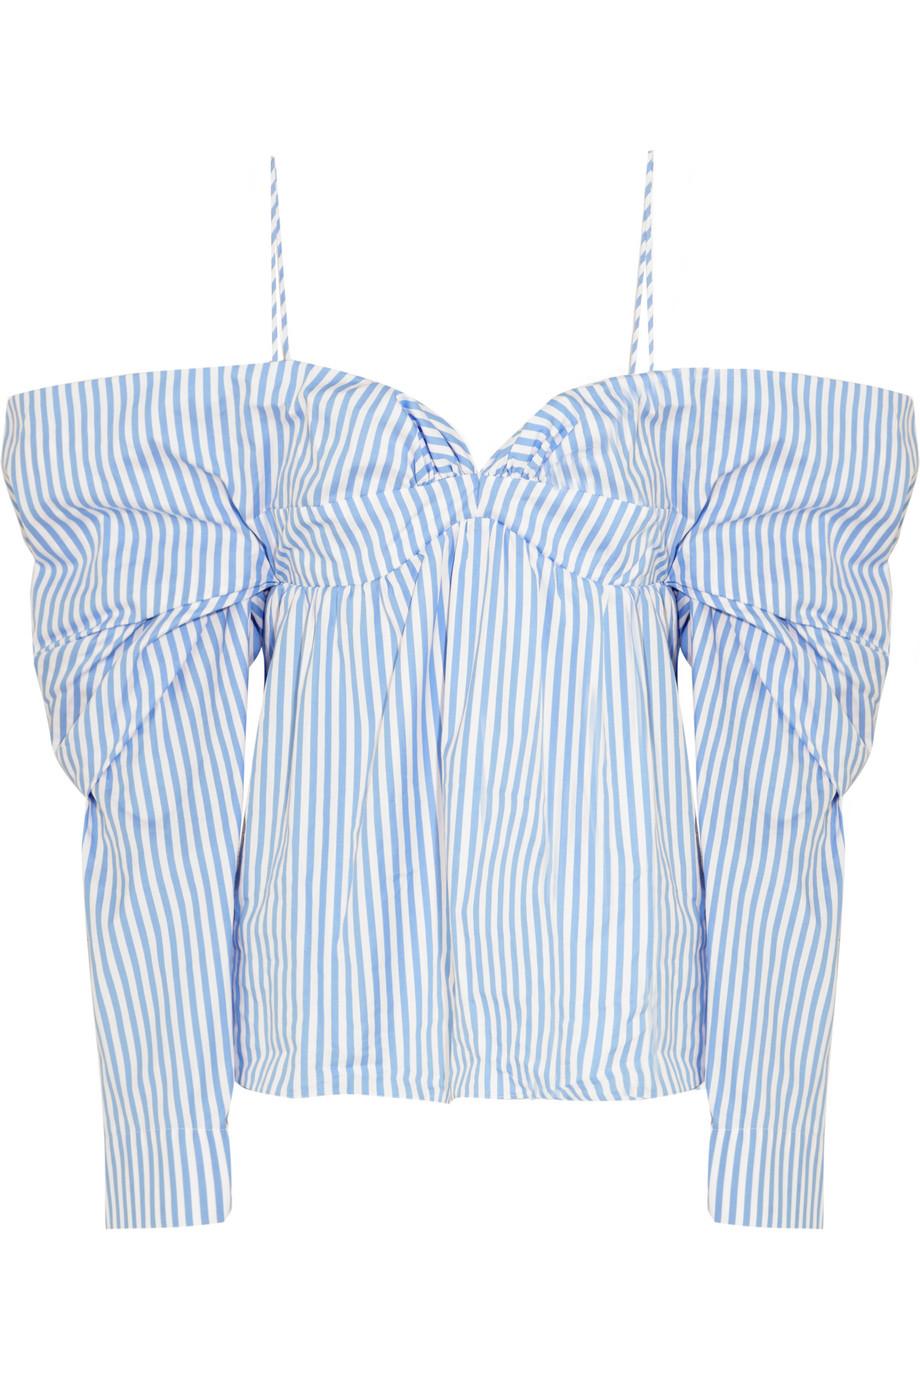 J.W.Anderson Off-the-Shoulder Striped Cotton-Poplin Top, Light Blue, Women's, Size: 12